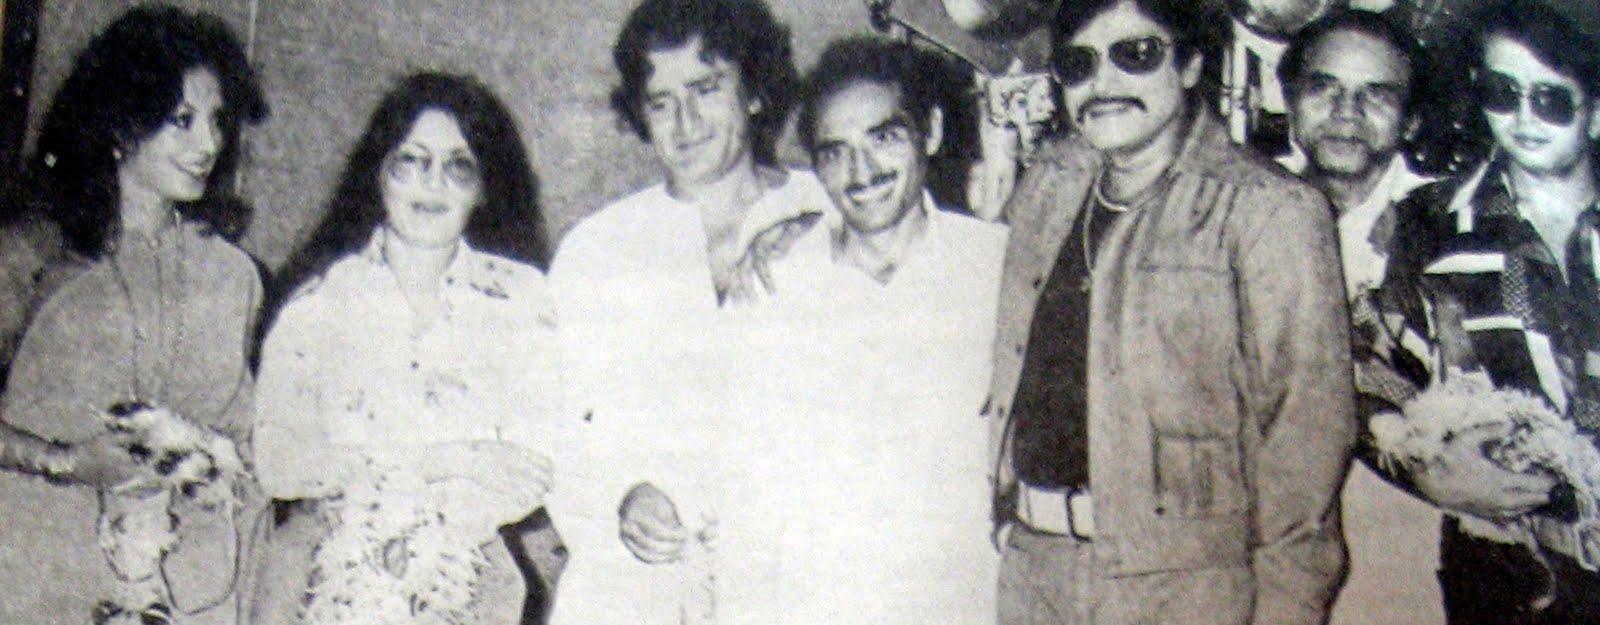 Angeli Gonzales (b. 1994),Ronald Leigh-Hunt (1920?005) Porn clips Mercedes McCambridge,Scott Yaphe